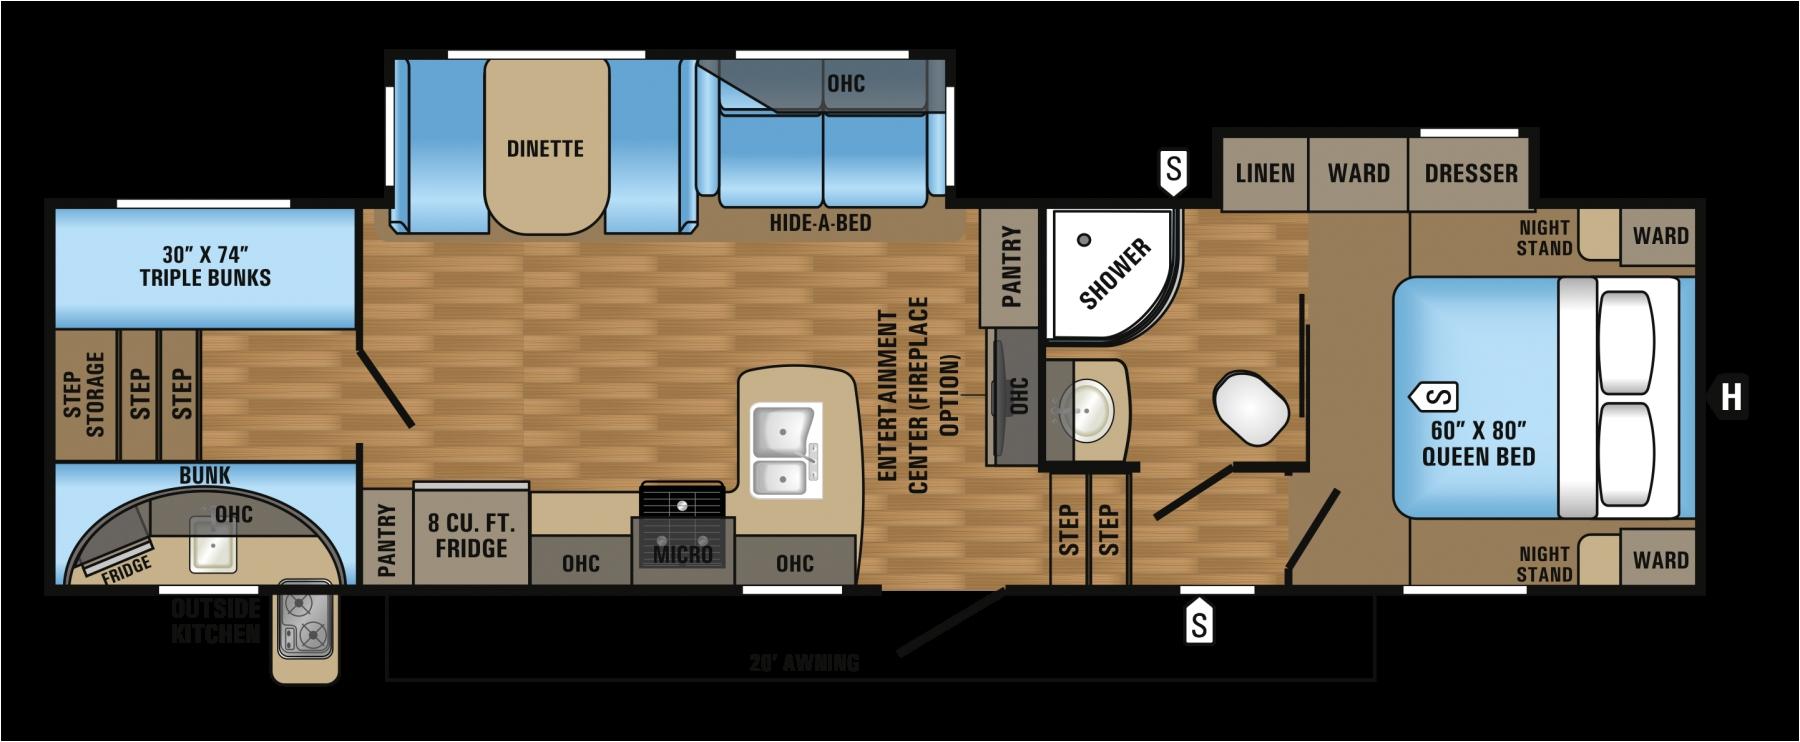 3 bedroom rv floor plan 5th wheel camper floor plans 2017 eagle ht fifth wheel floorplans amp